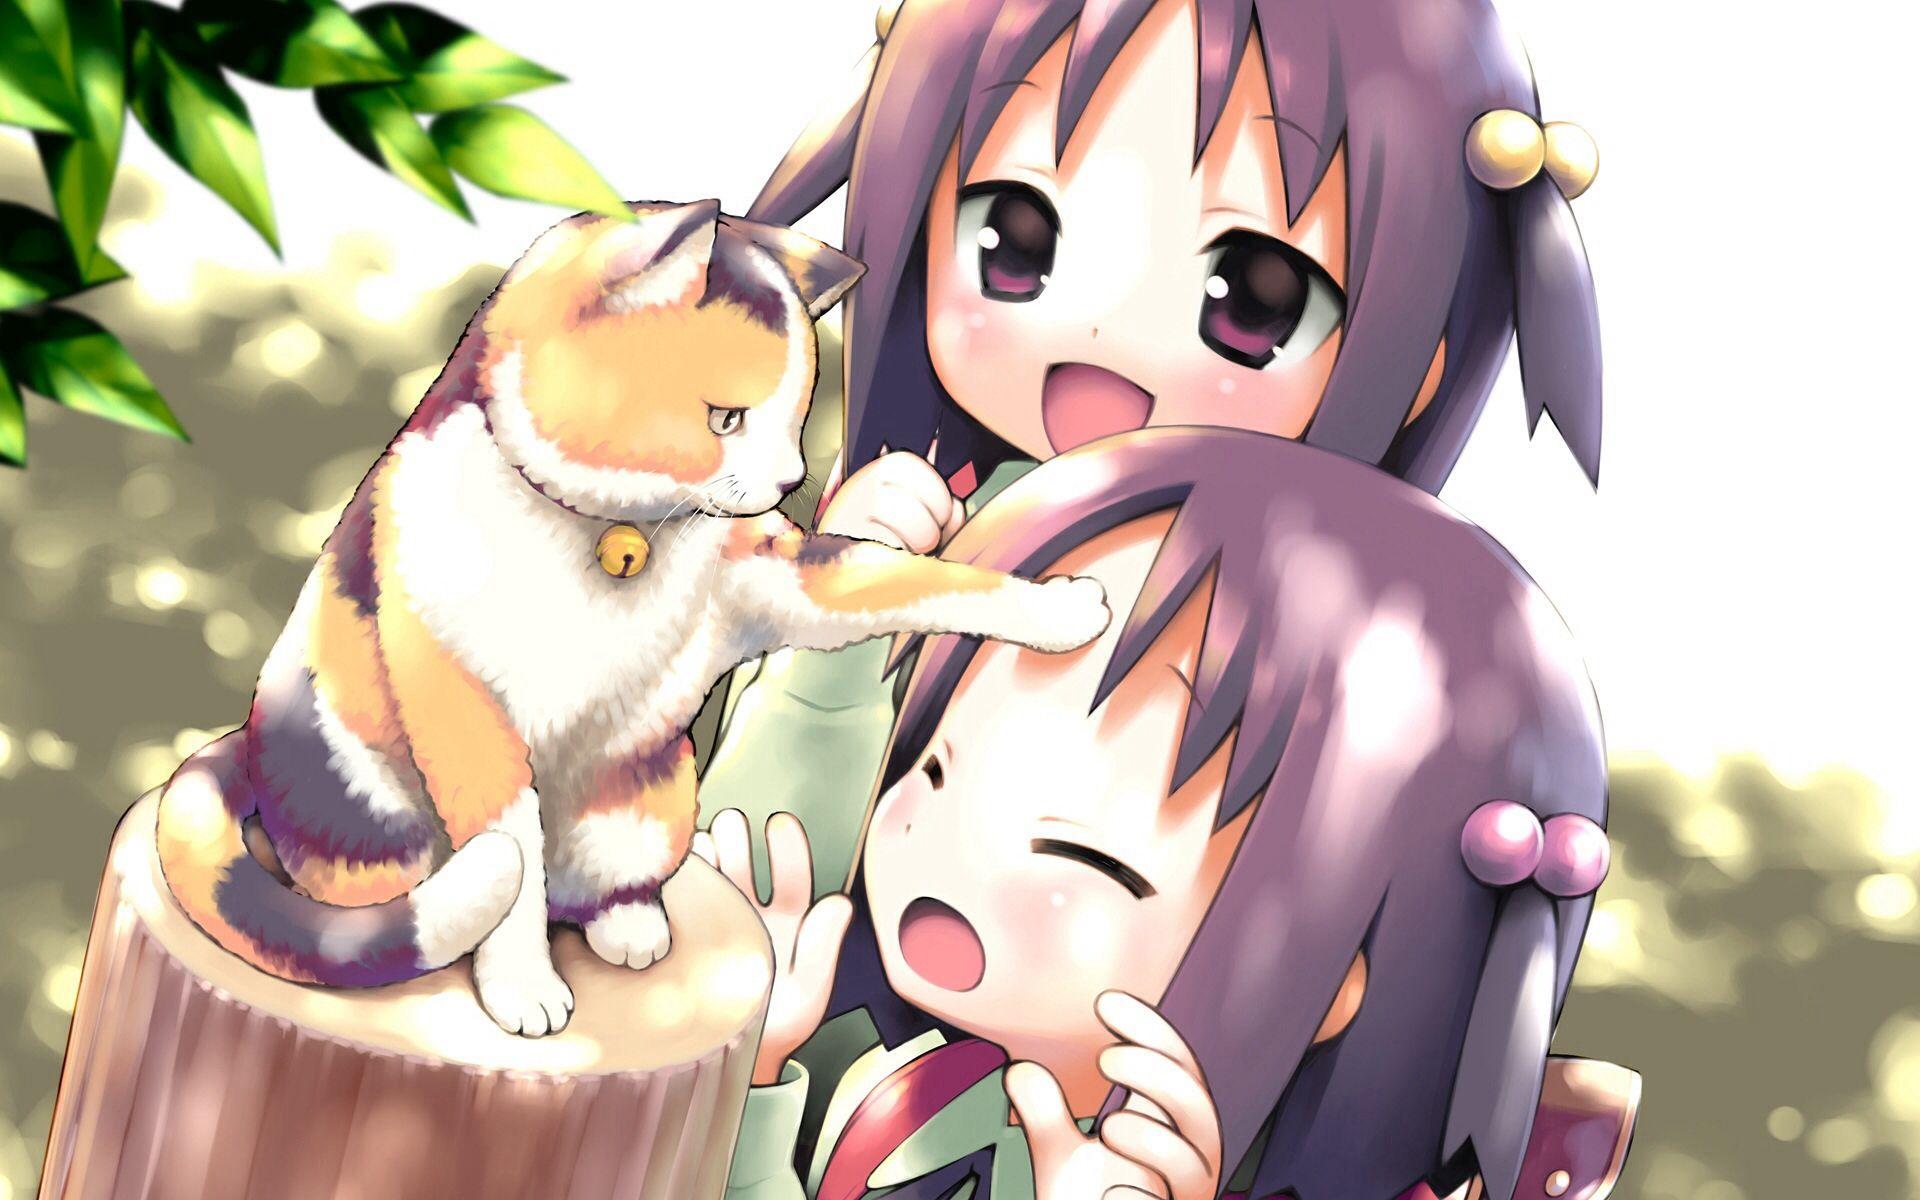 Pin by Alice Vandot on Anime kids  Anime sisters, Anime child, Anime